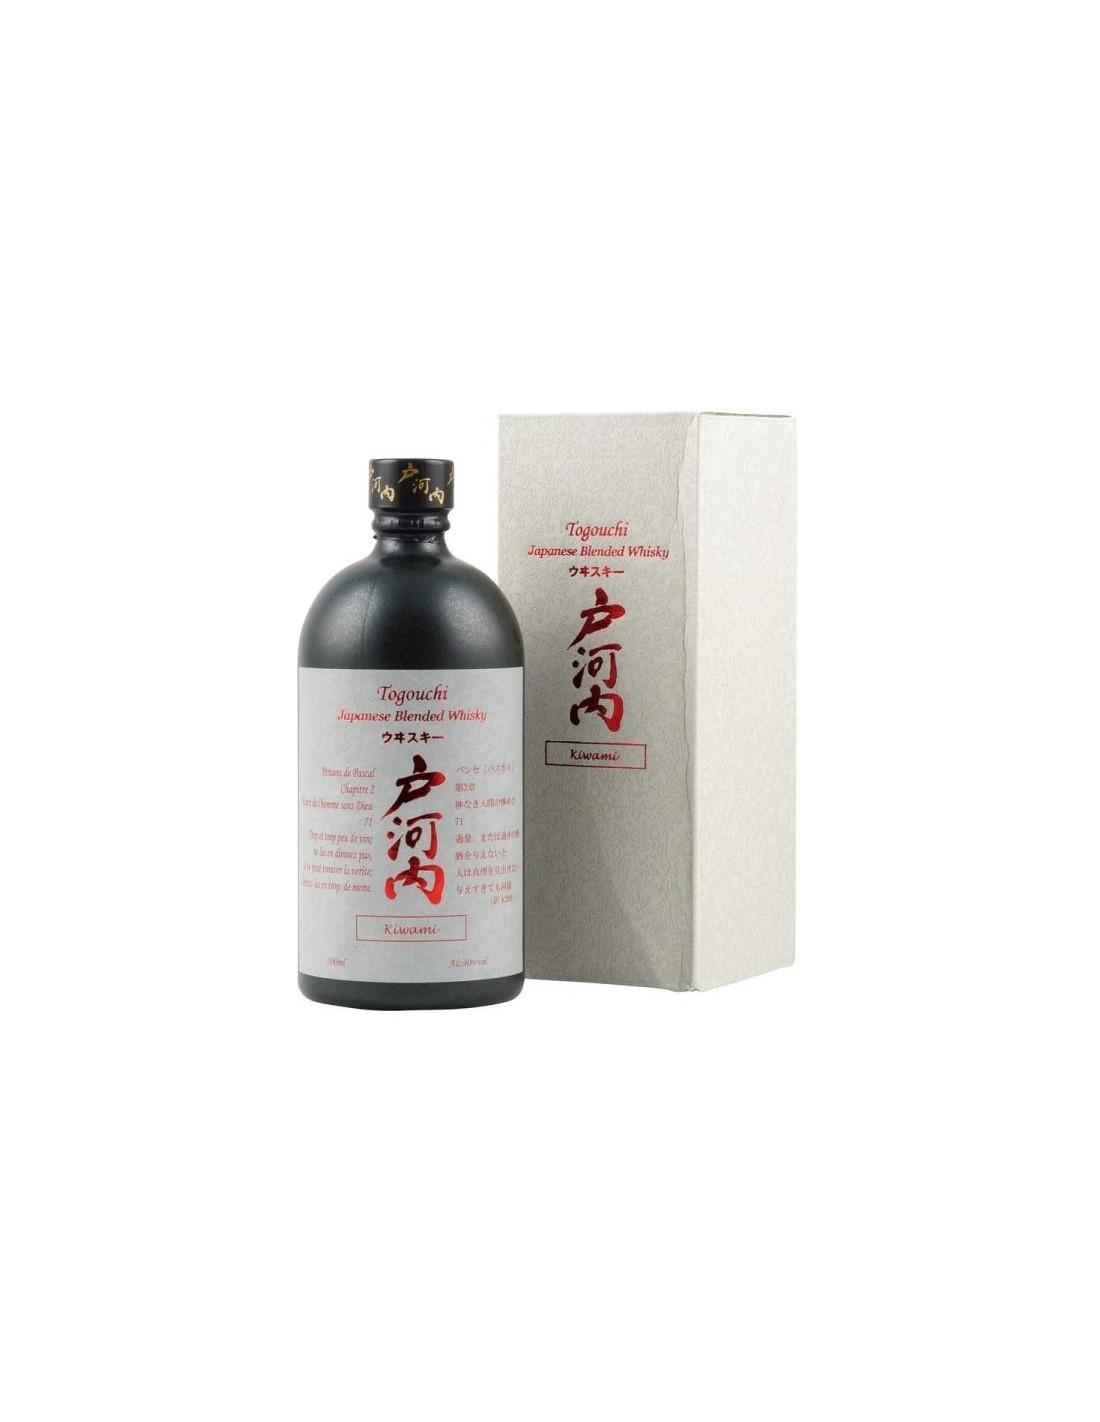 Whisky Togouchi Blended Kiwami, 40% alc., 0.7L, Japonia